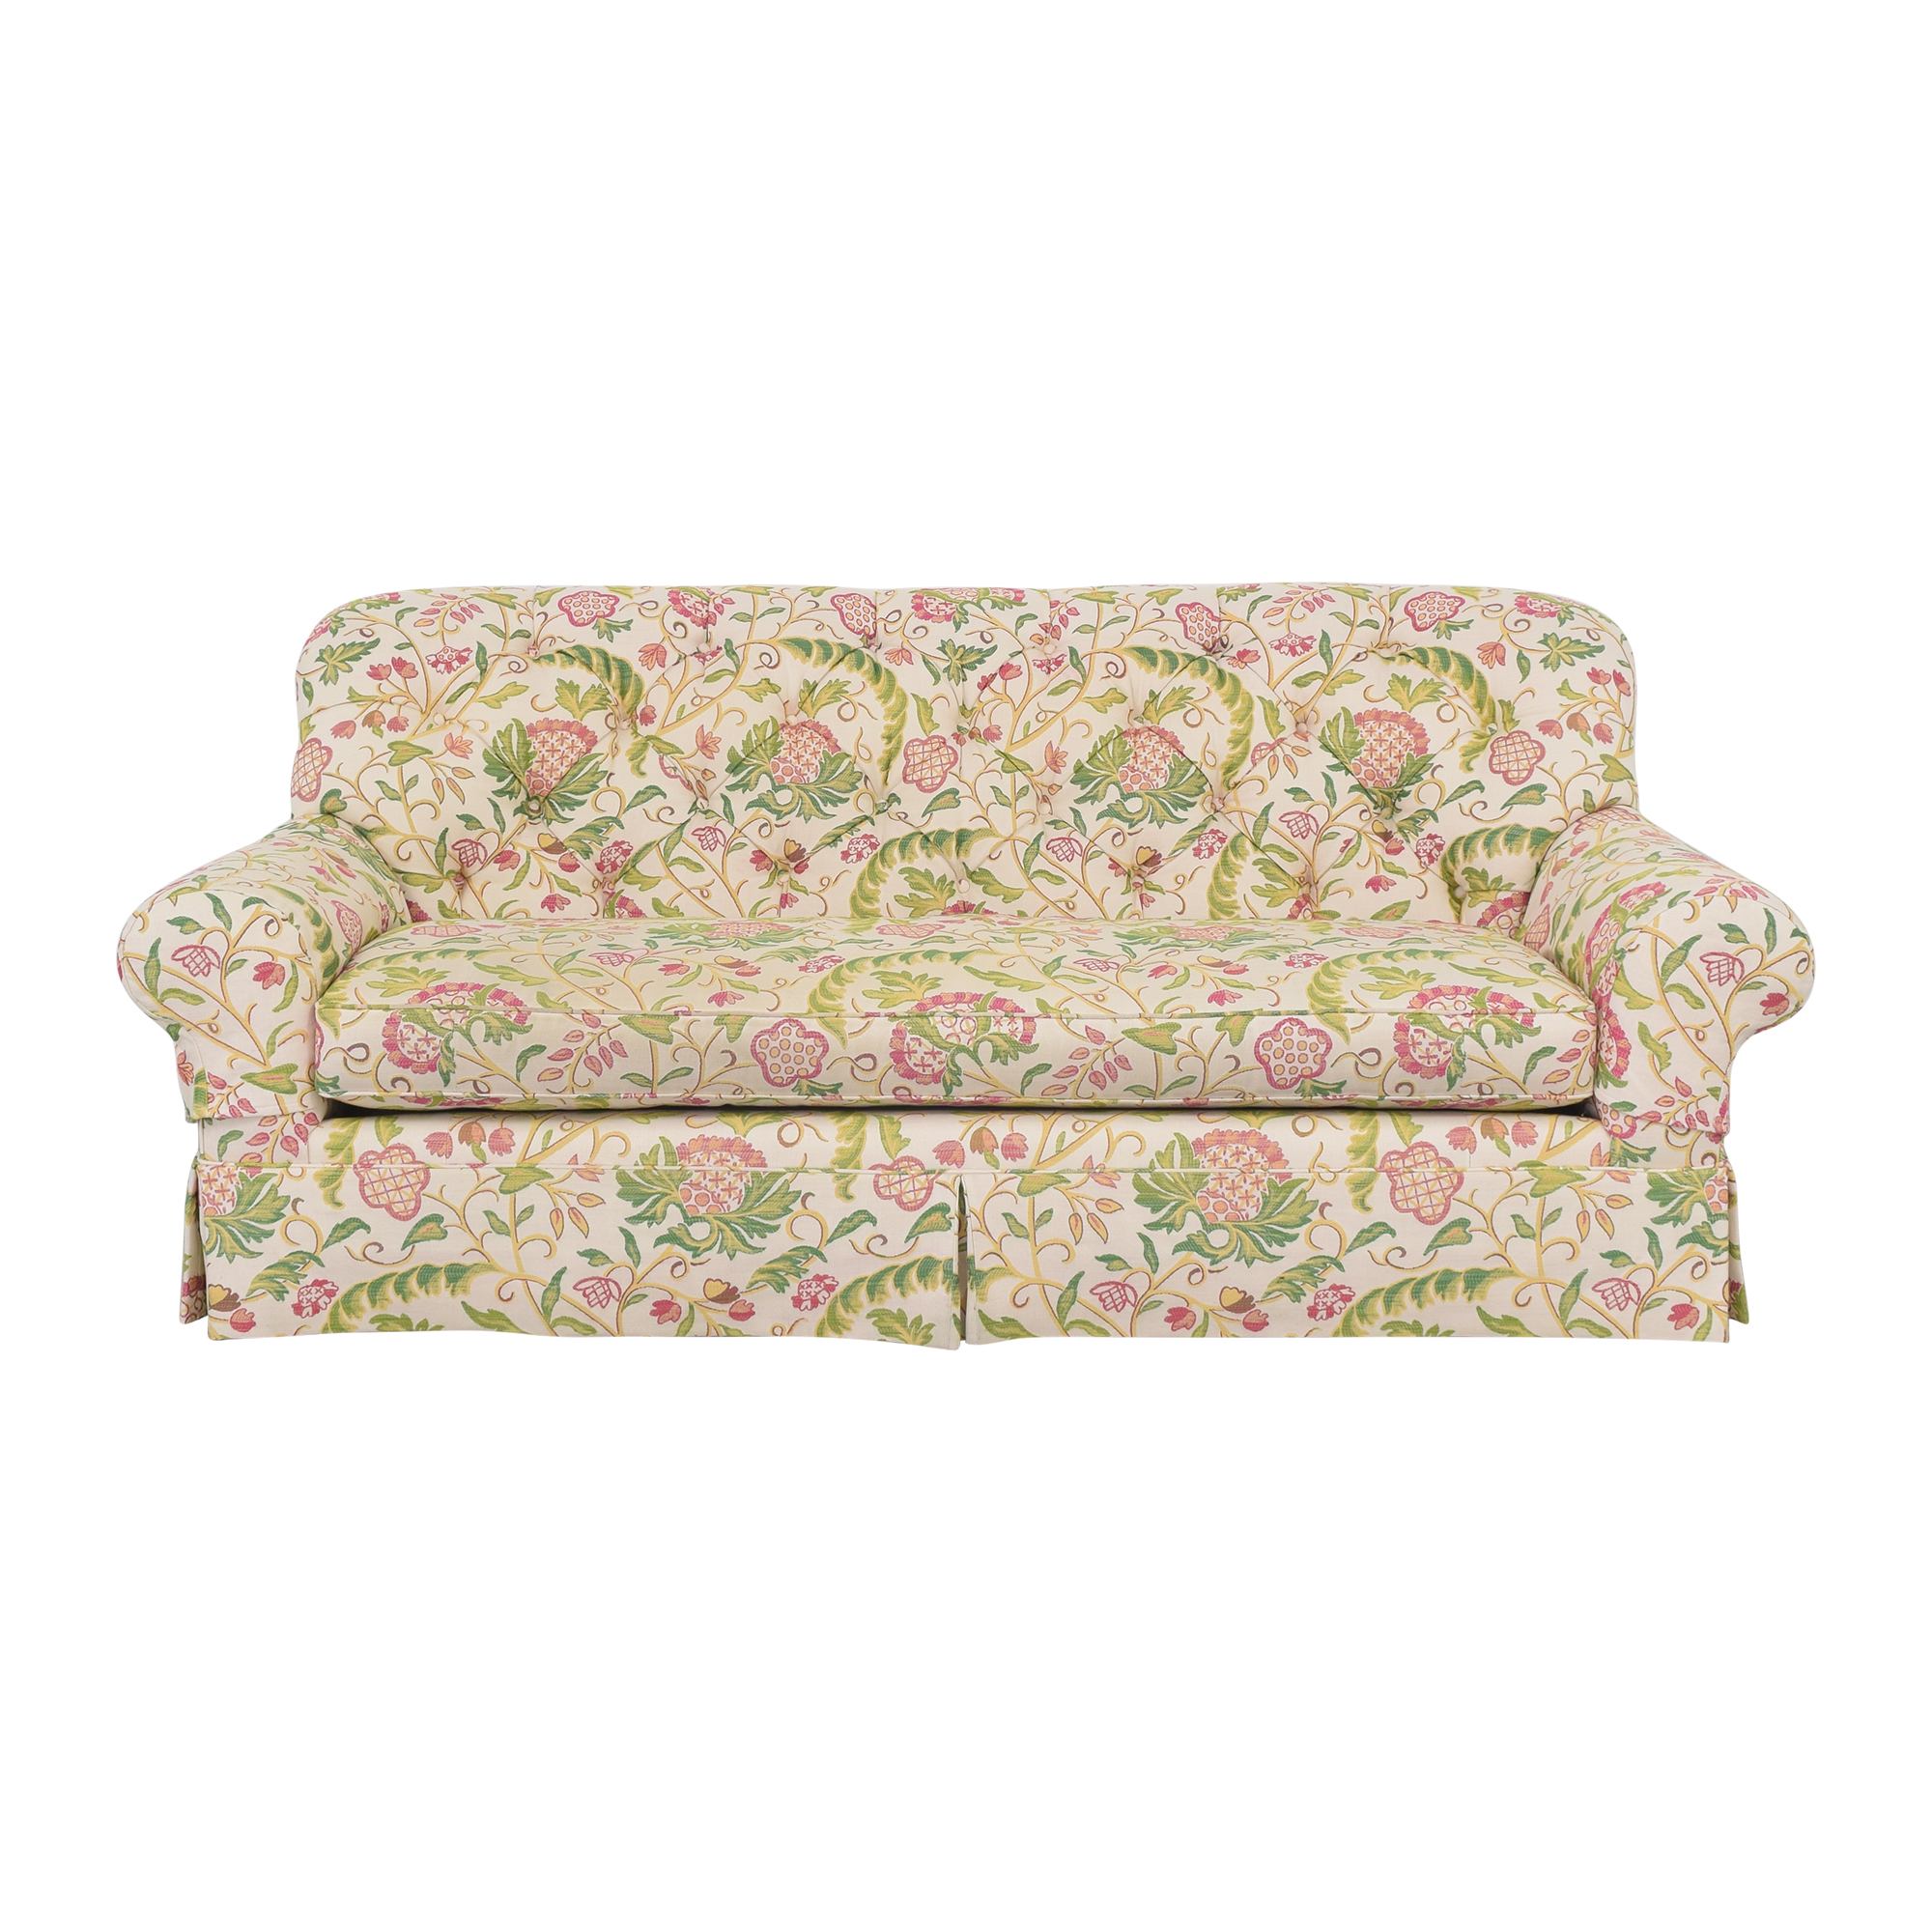 Stickley Furniture Stickley Furniture Custom Upholstered Sofa used